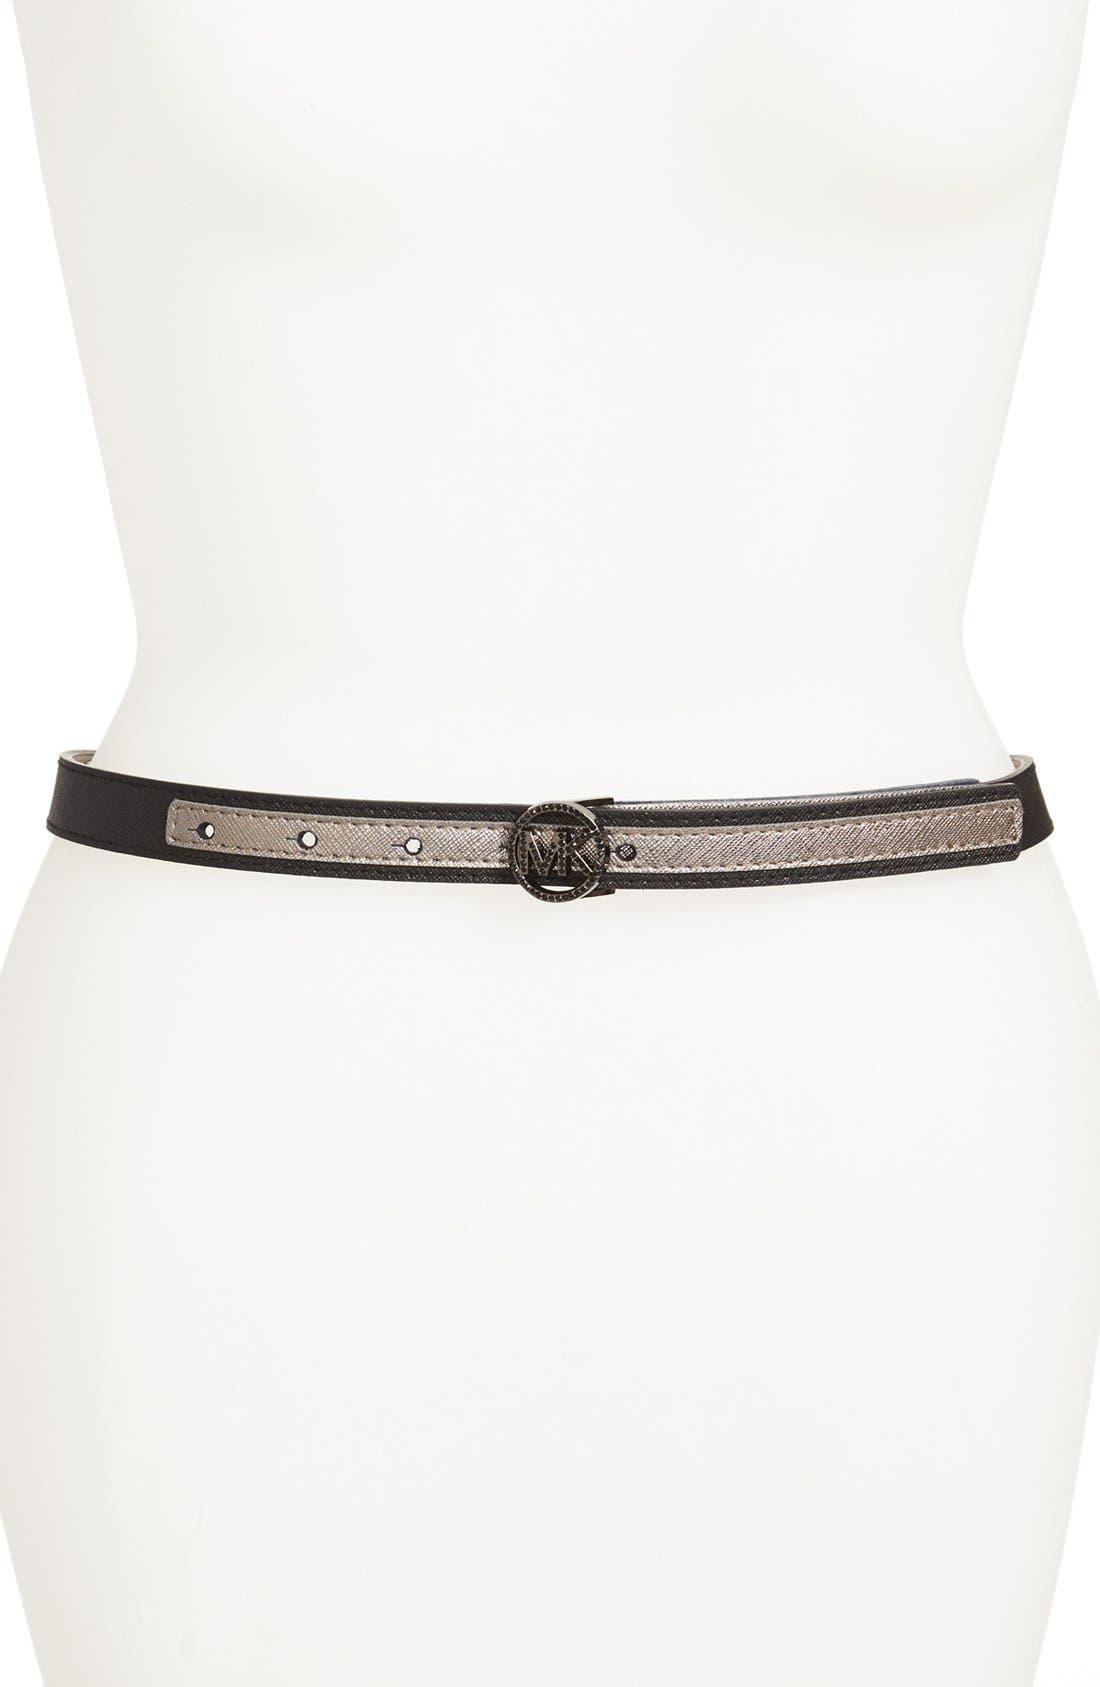 Alternate Image 1 Selected - MICHAEL Michael Kors 'Pavé Logo Buckle' Two-Tone Saffiano Leather Belt